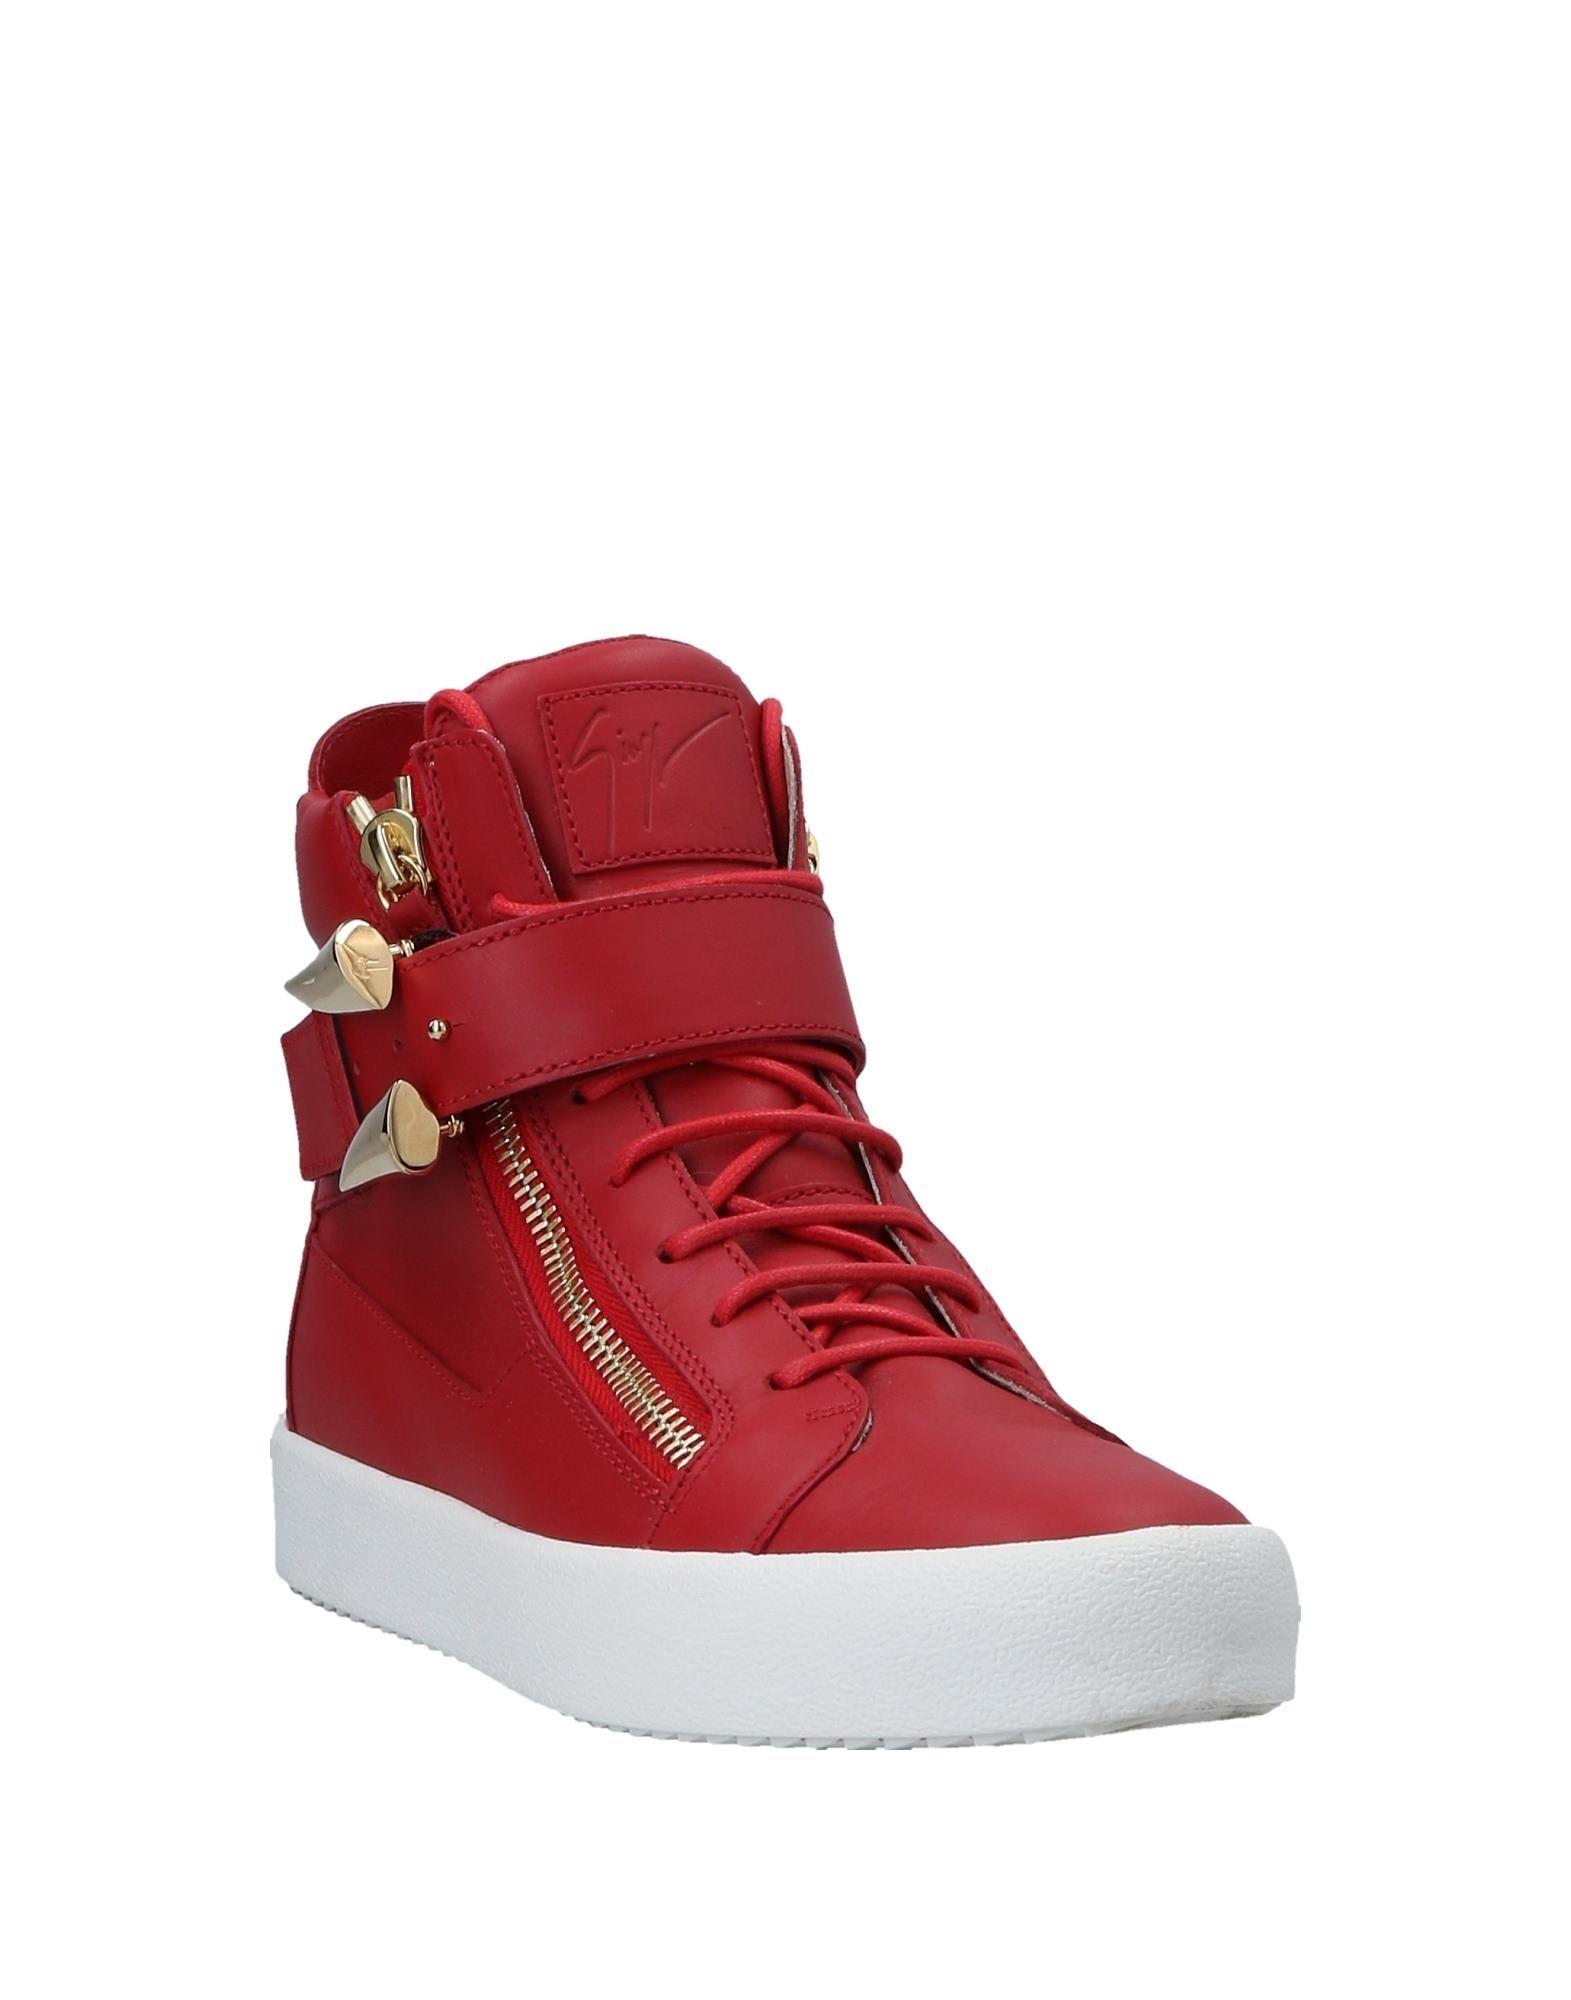 Giuseppe Zanotti Sneakers Qualität Herren  11330986SO Gute Qualität Sneakers beliebte Schuhe e1b438